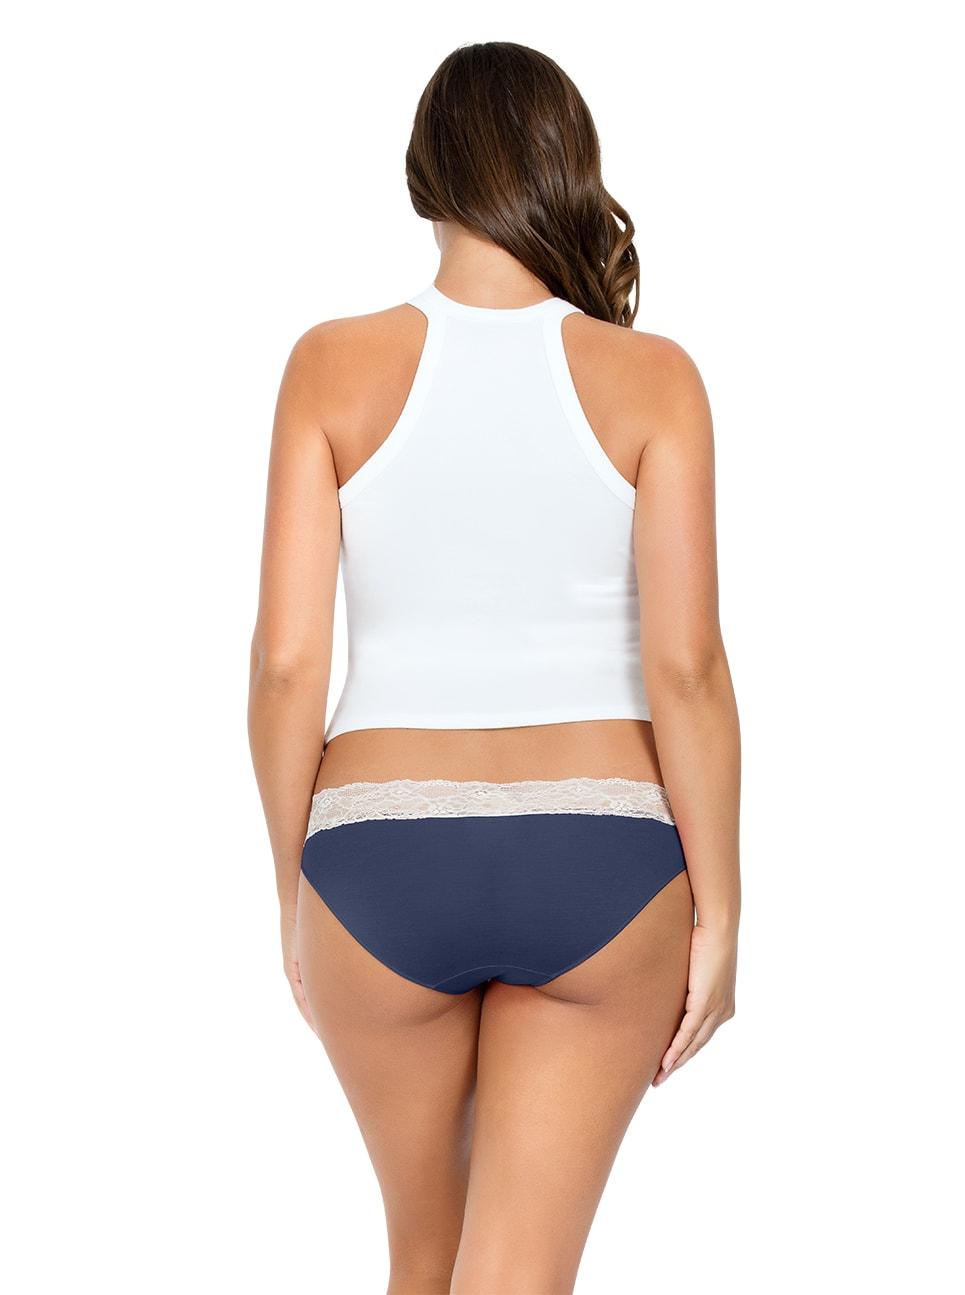 PARFAIT ParfaitPanty SoEssential BikiniPP303 NavyBlue Back - Panty So Essential Bikini- Navy - PP303